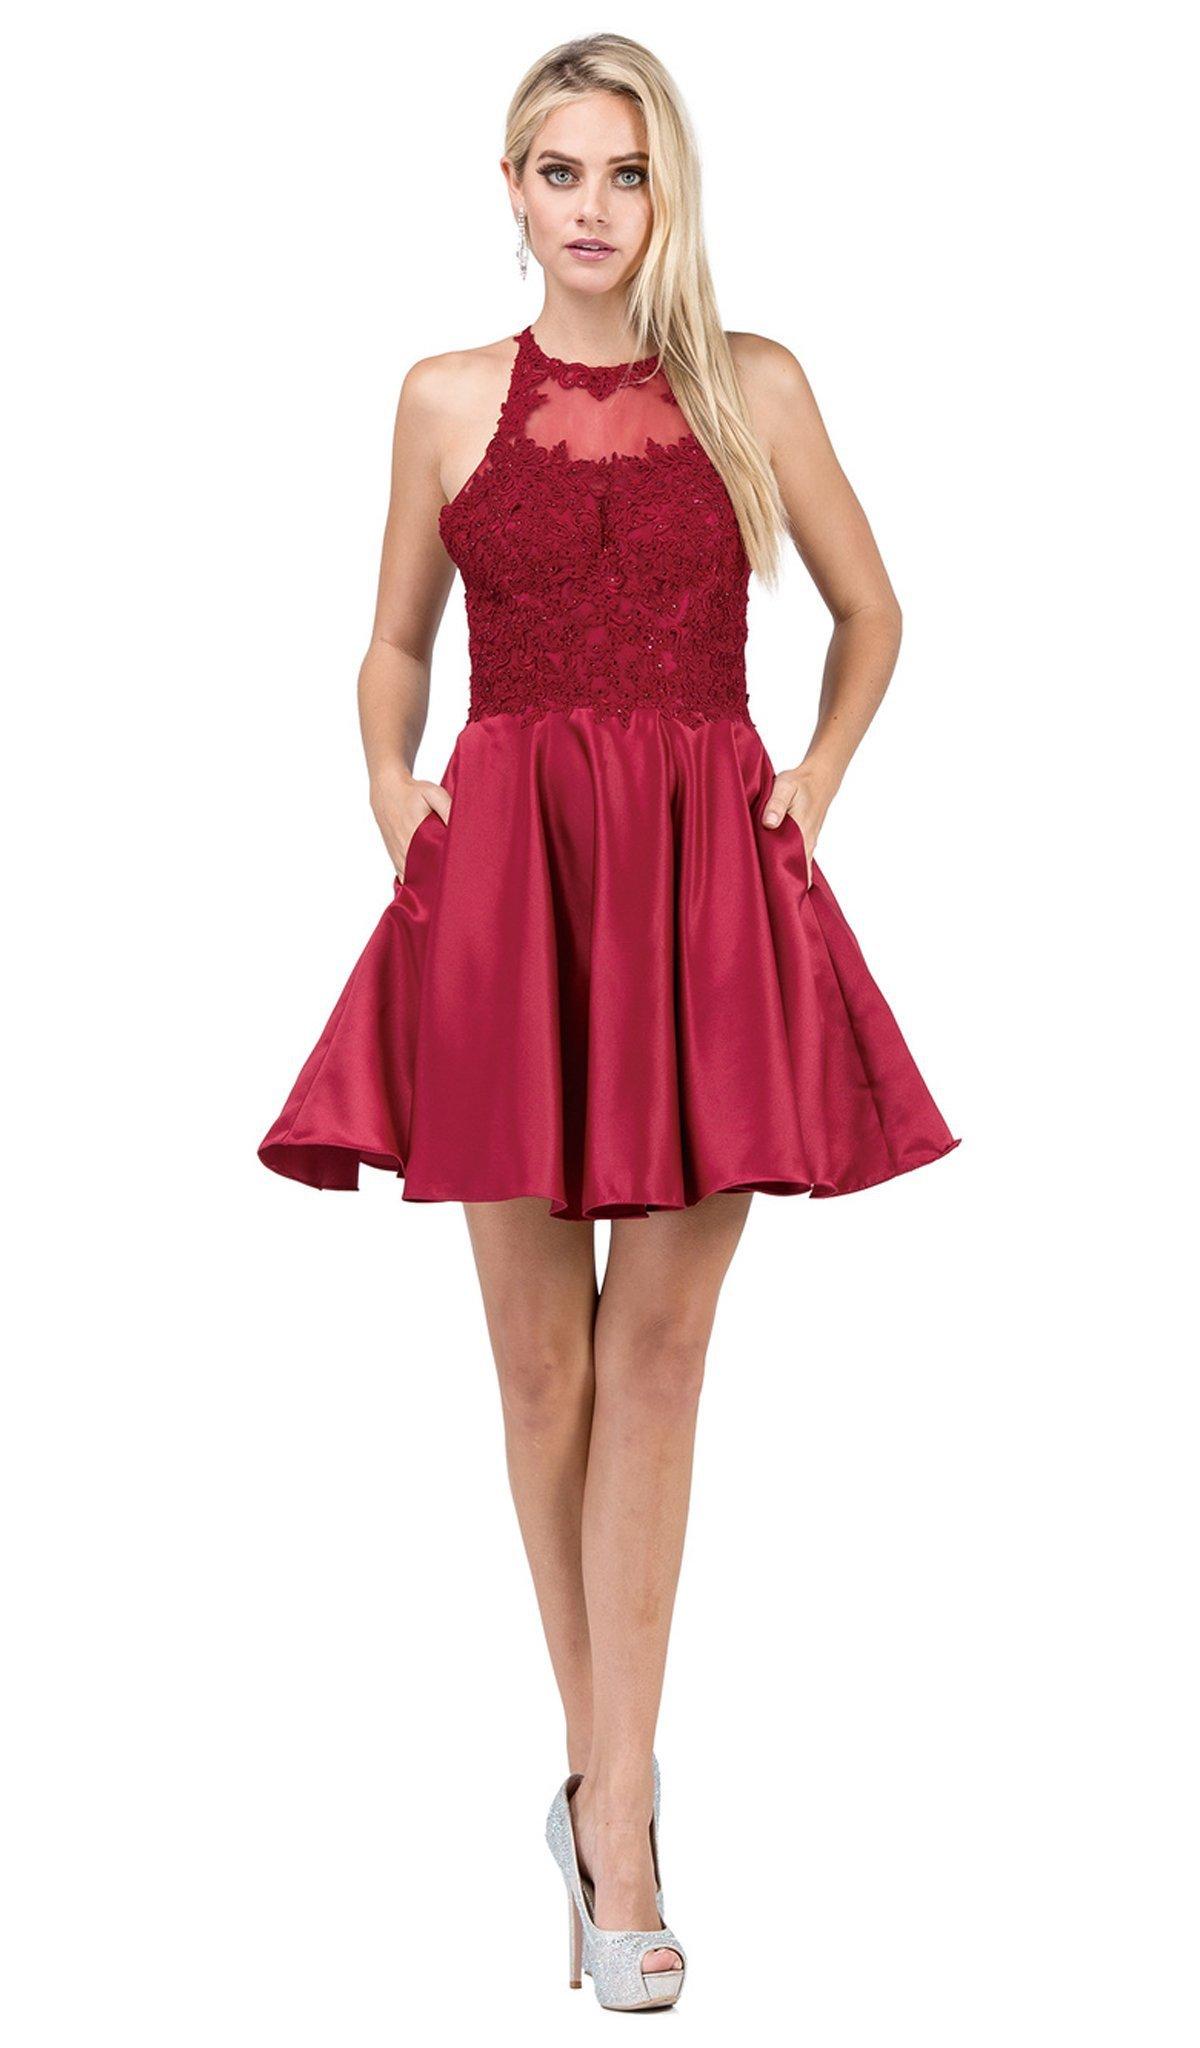 Dancing Queen - 3028 Halter A-Line Homecoming Cocktail Dress